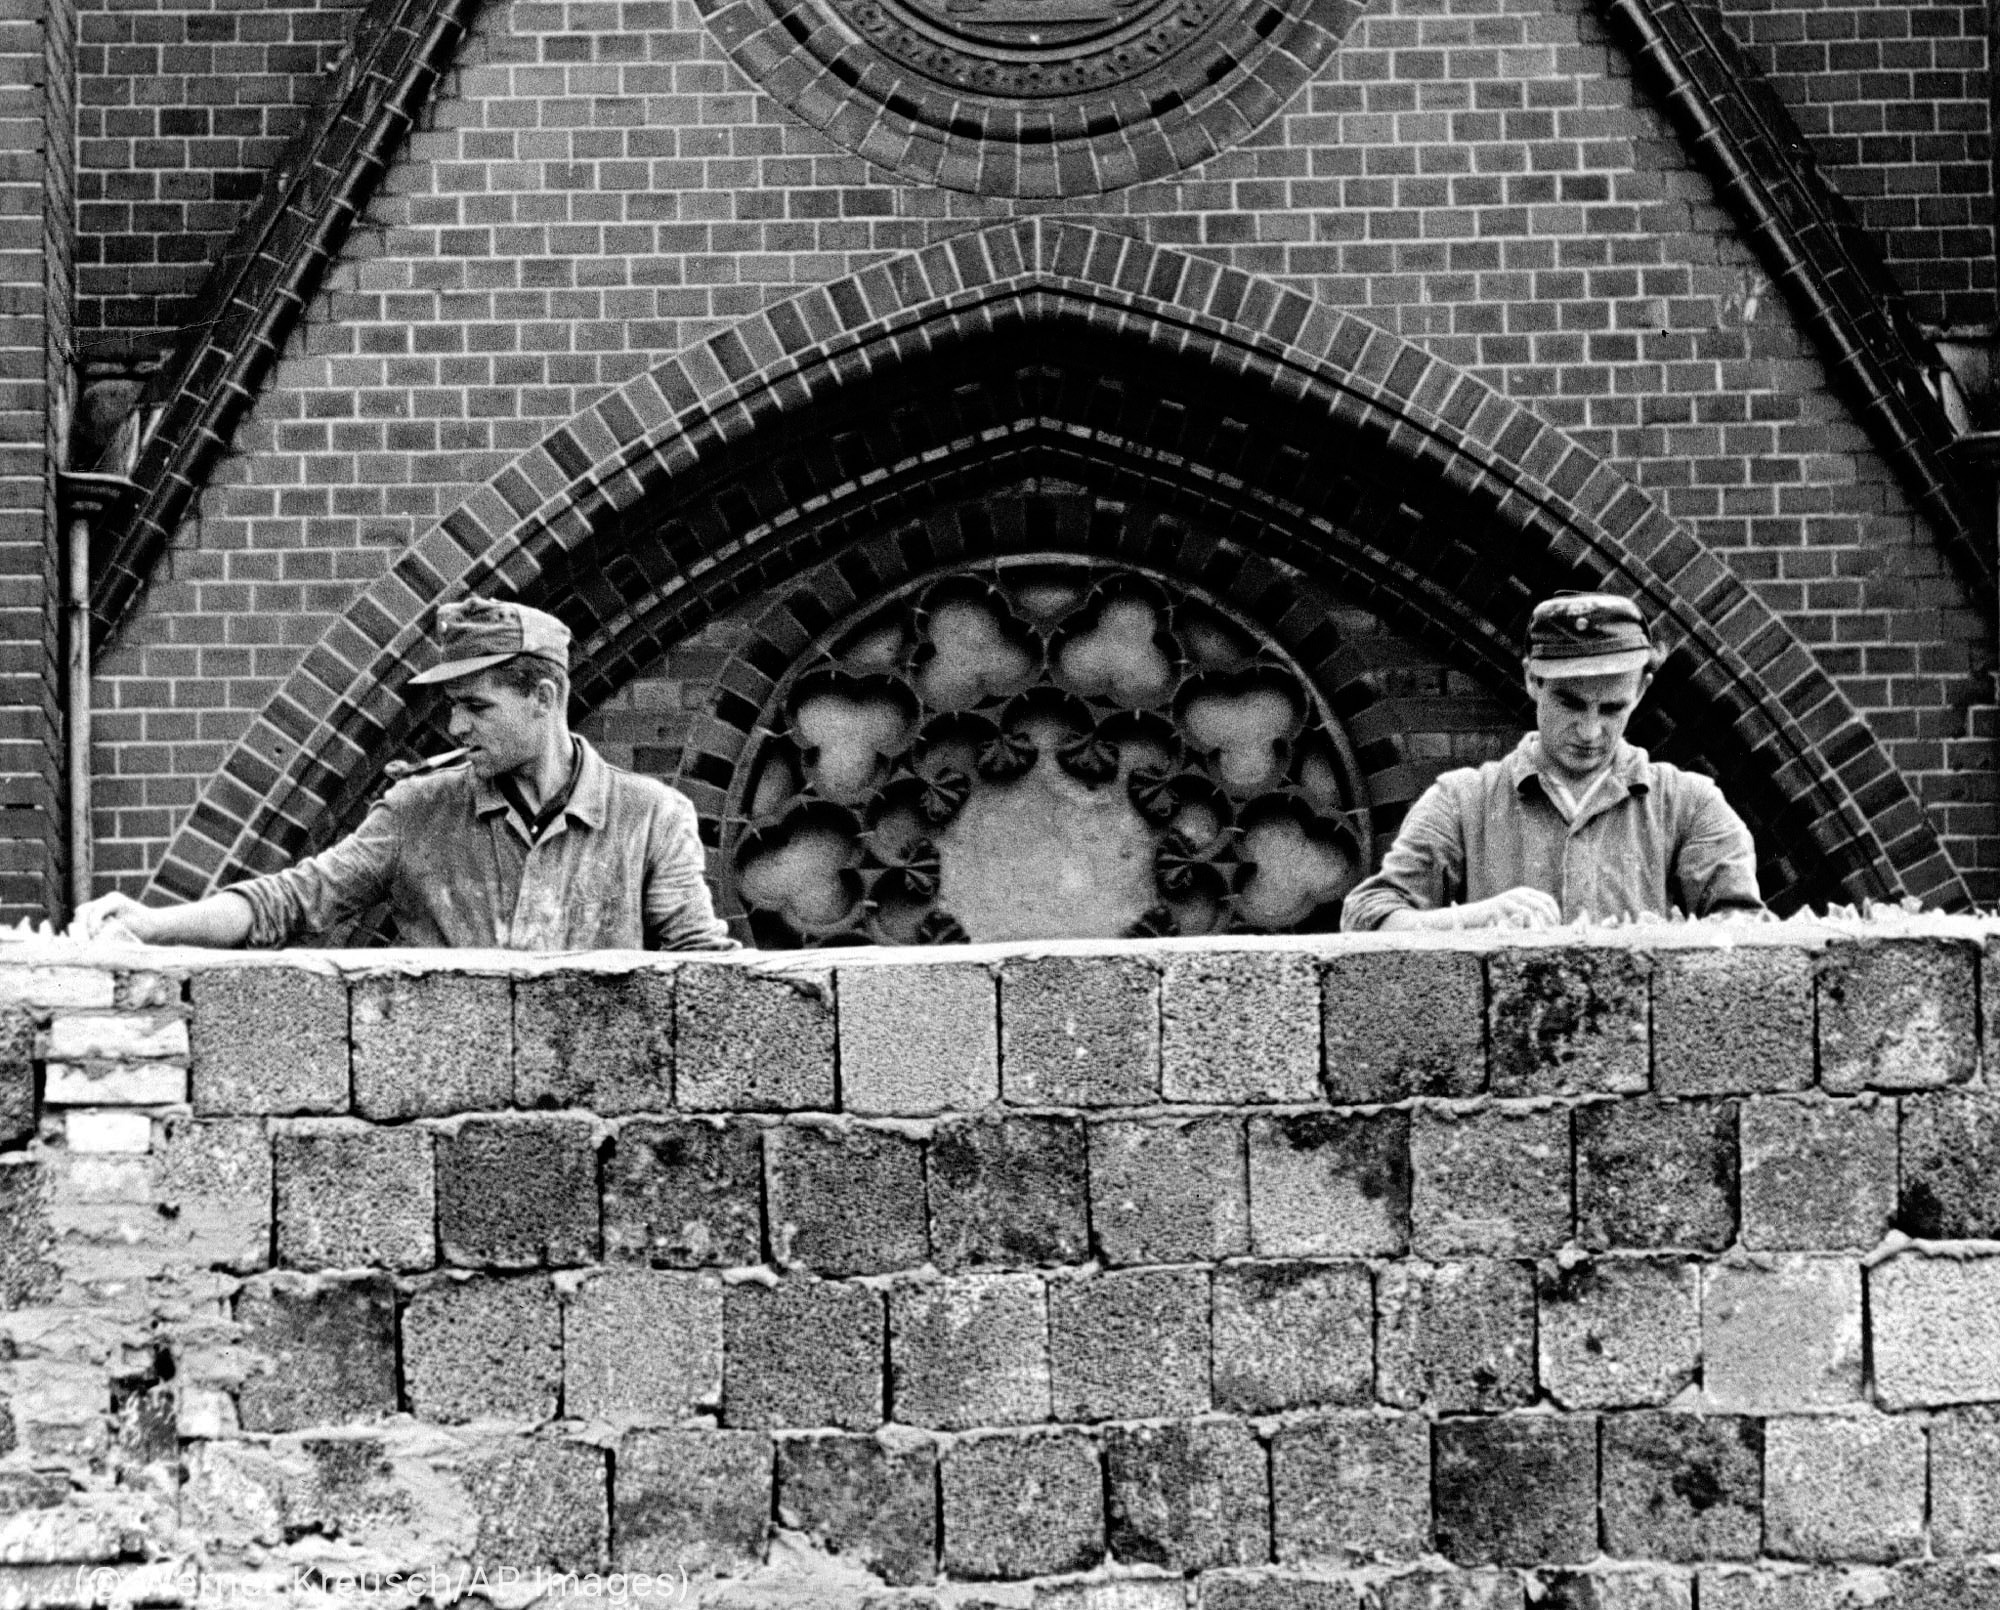 Uniformed men placing glass on top of concrete wall (© Werner Kreusch/AP Images)